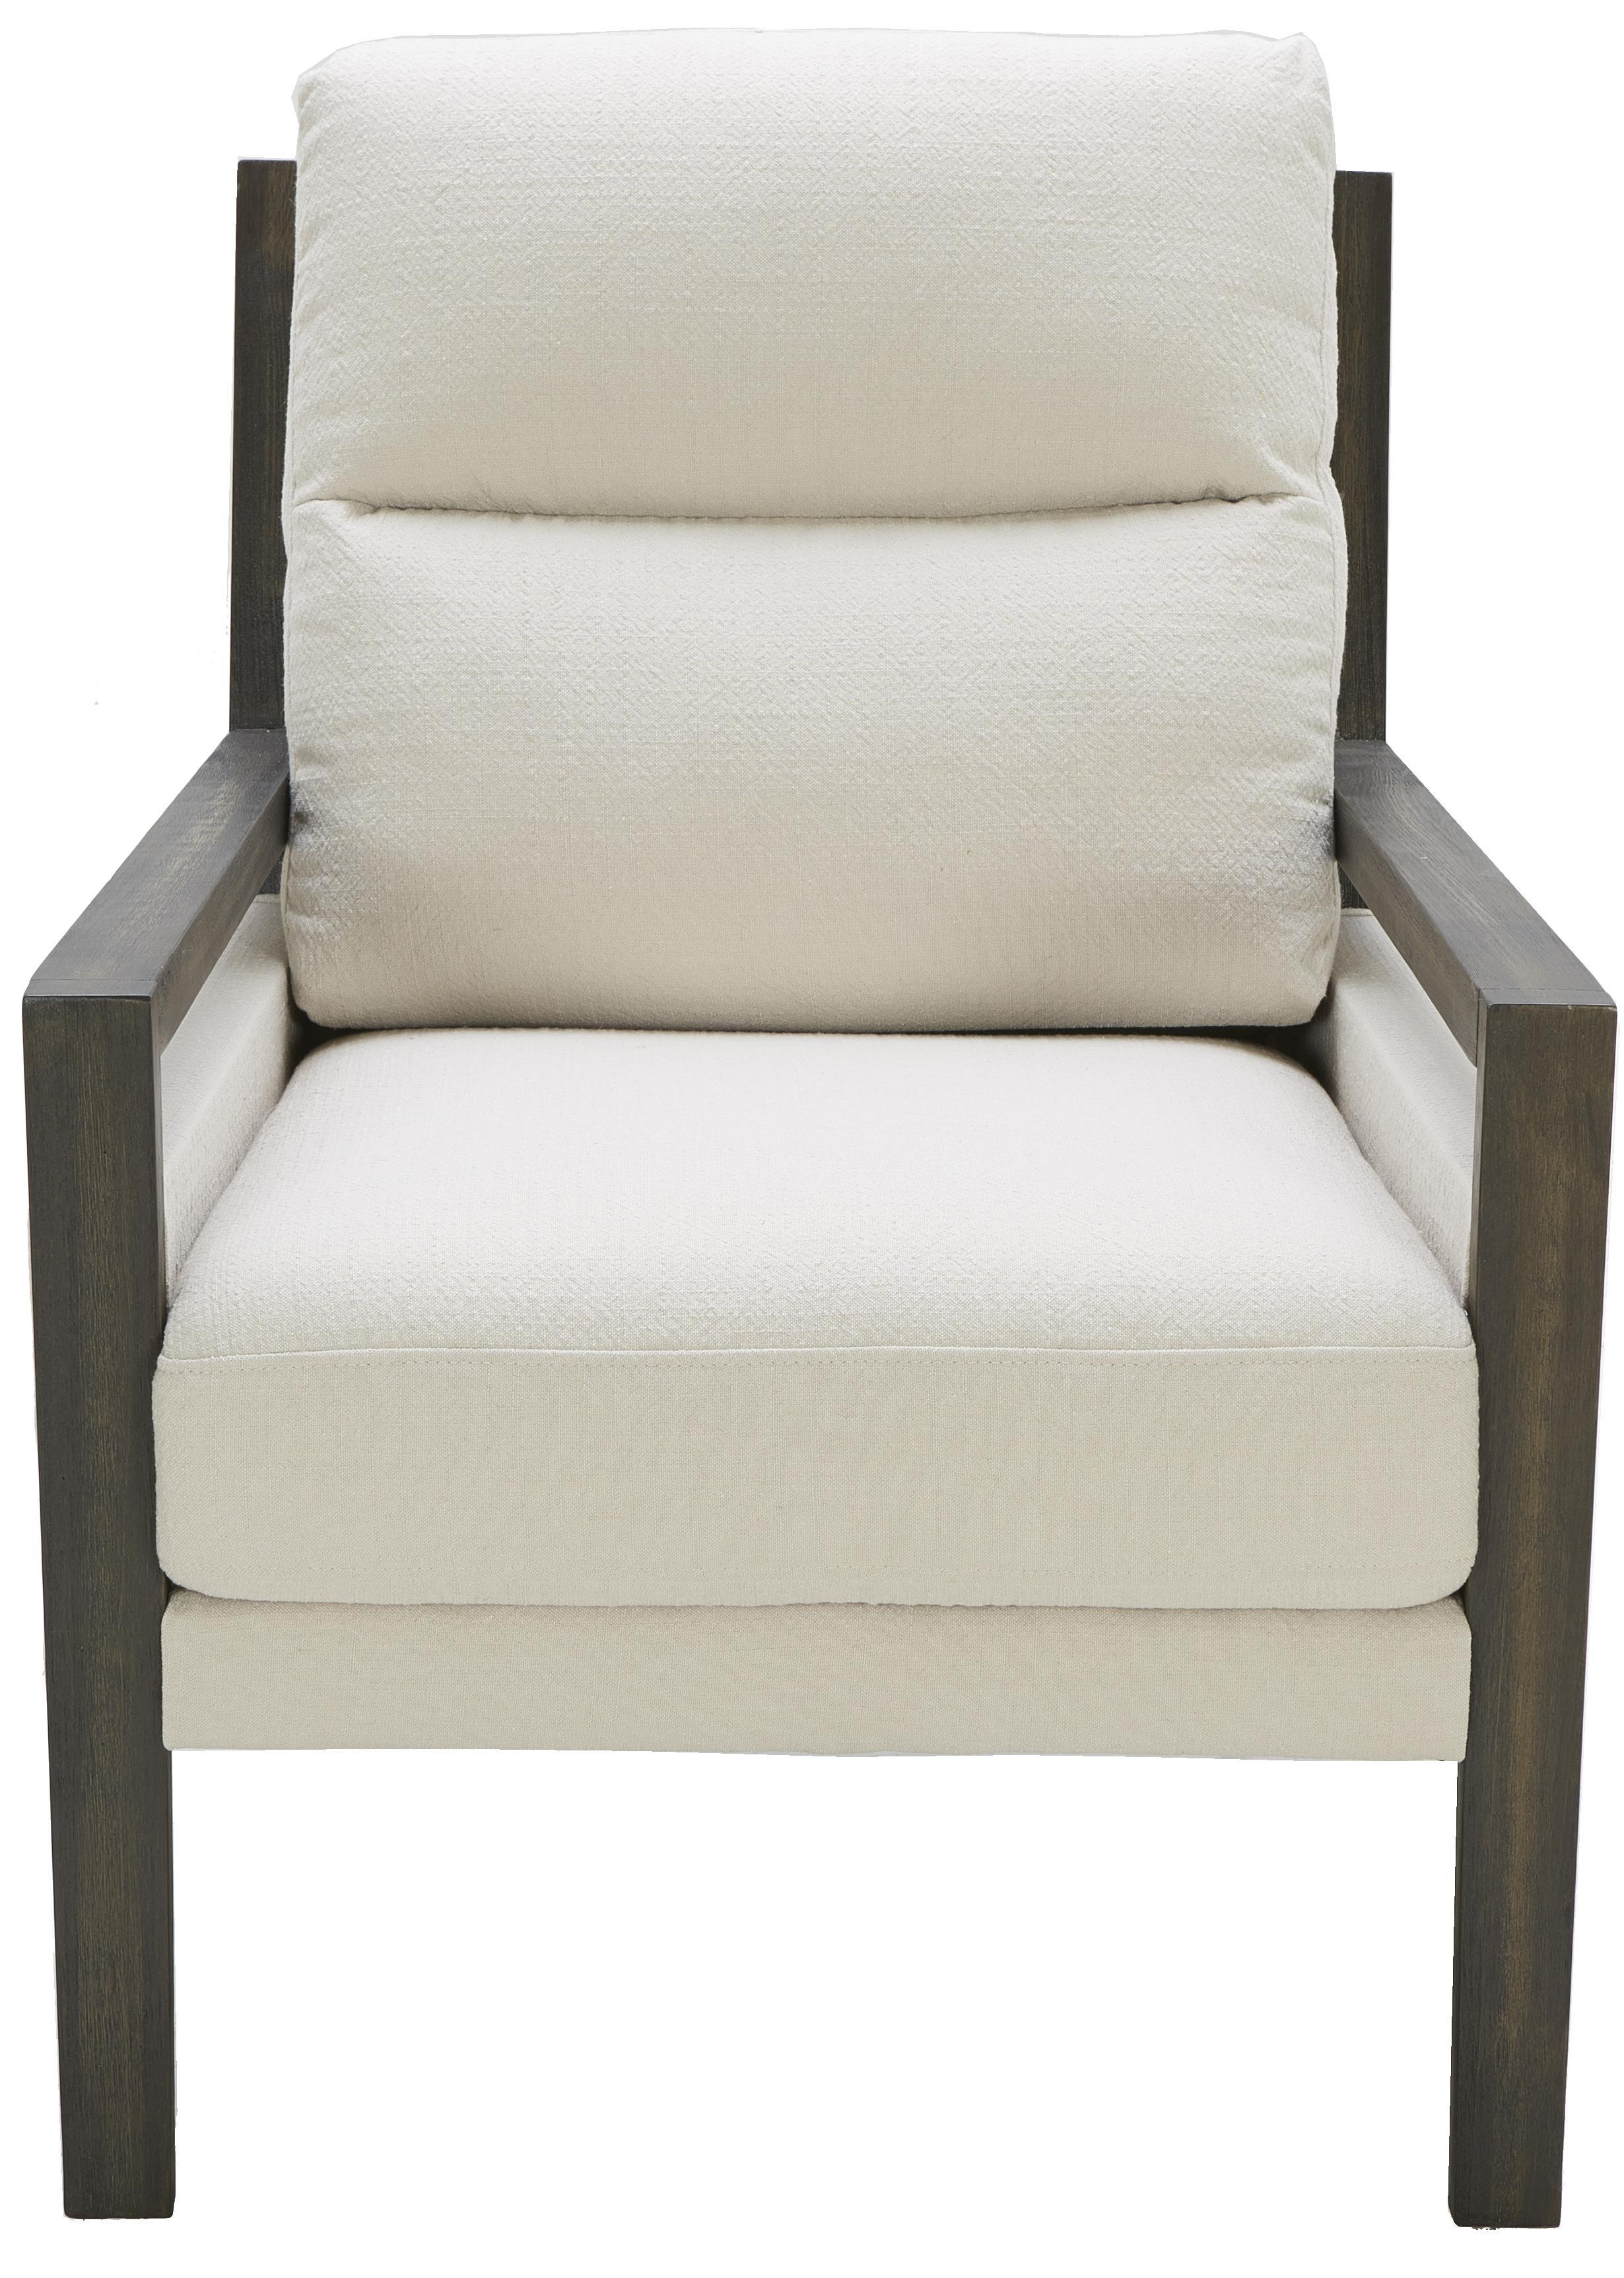 Urban Evolution Carper Contemporary Chair - Item Number: A-912C-D228